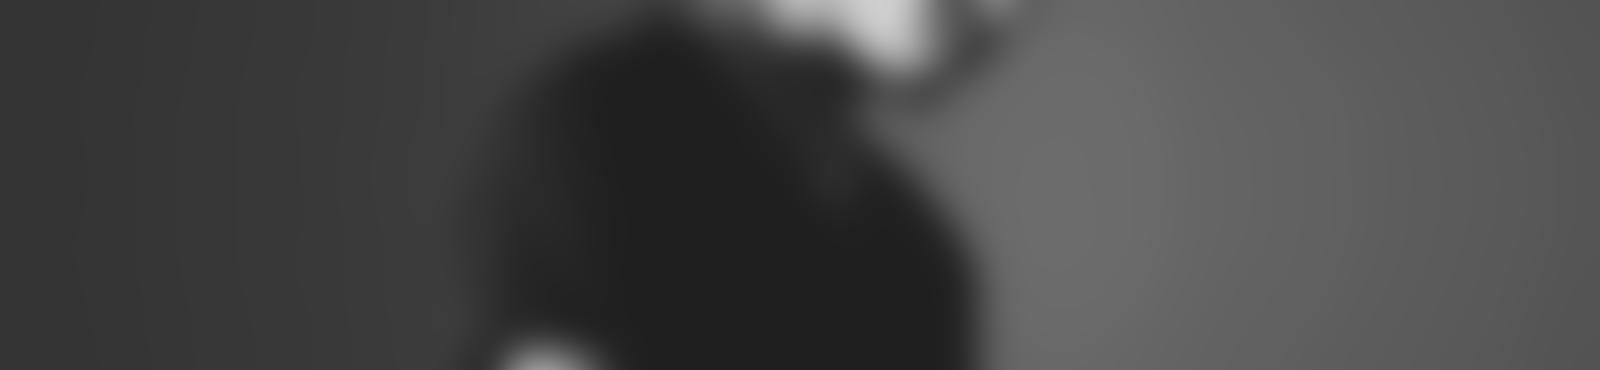 Blurred cb1262ed fb83 4ed8 9e4c 8c0cf8a343bd